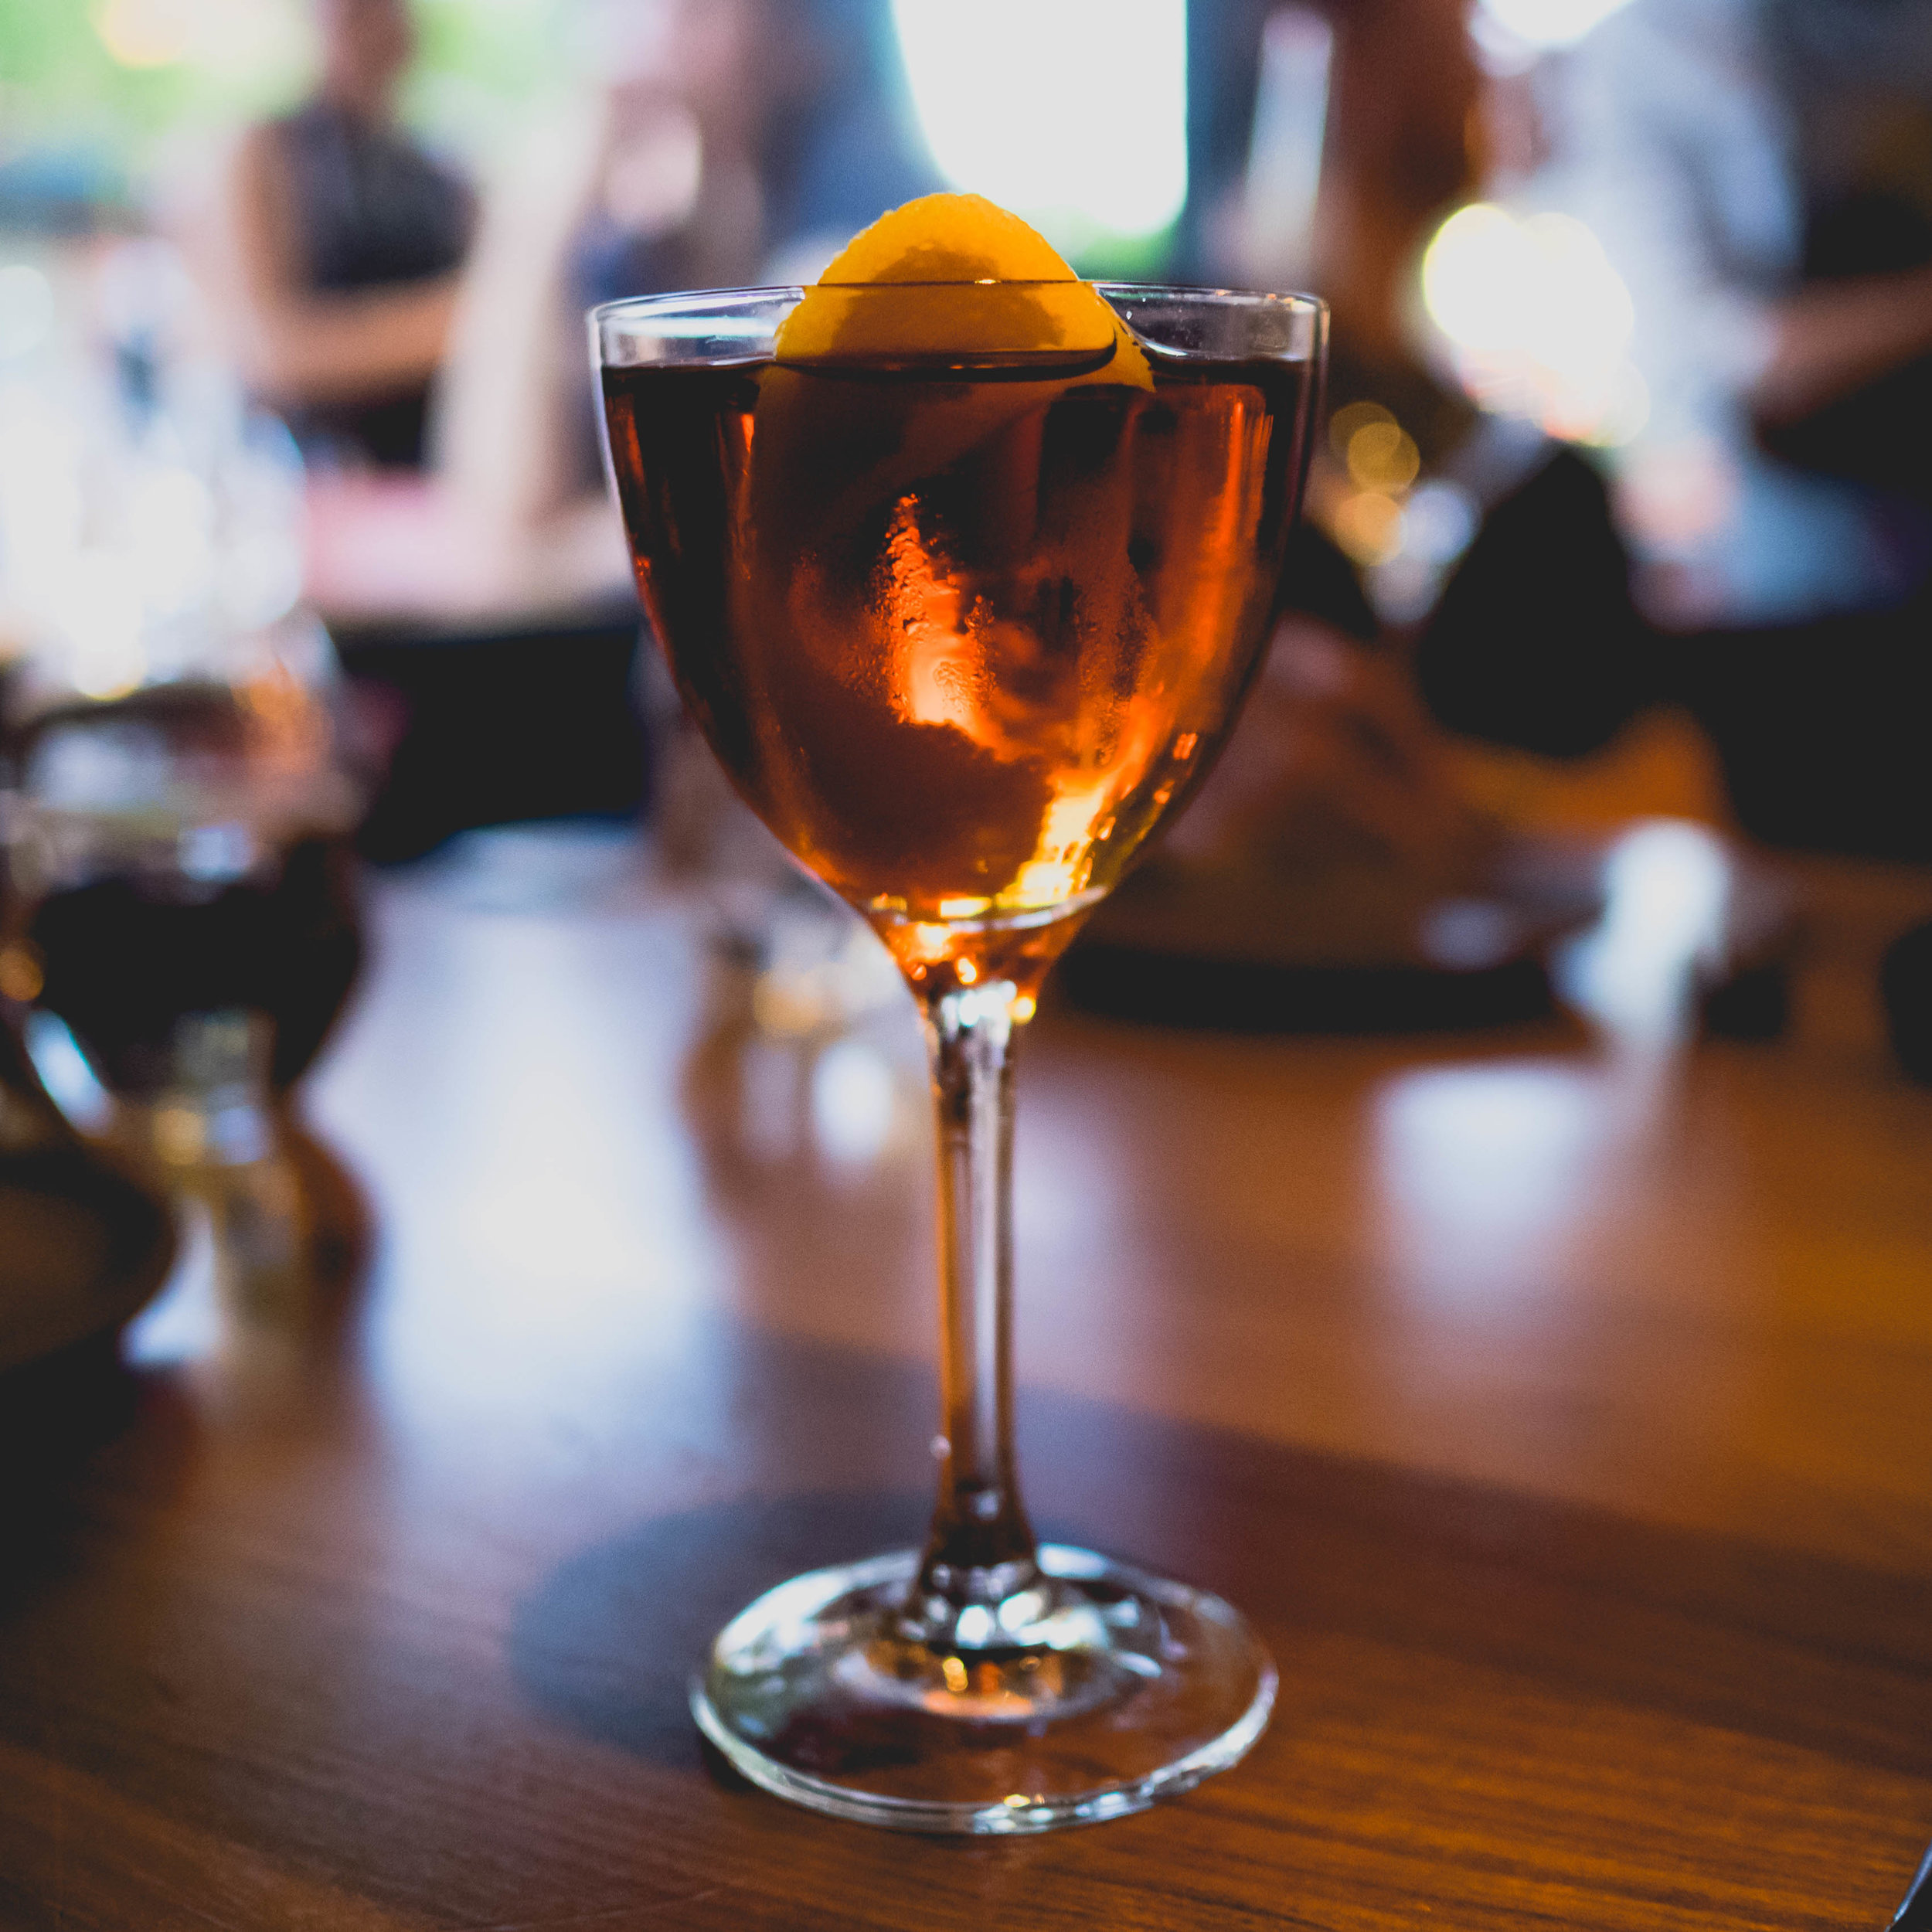 strozzino : tequila reposado, cynar '70', sweet vermouth, maraschino liqueur, orange twist.